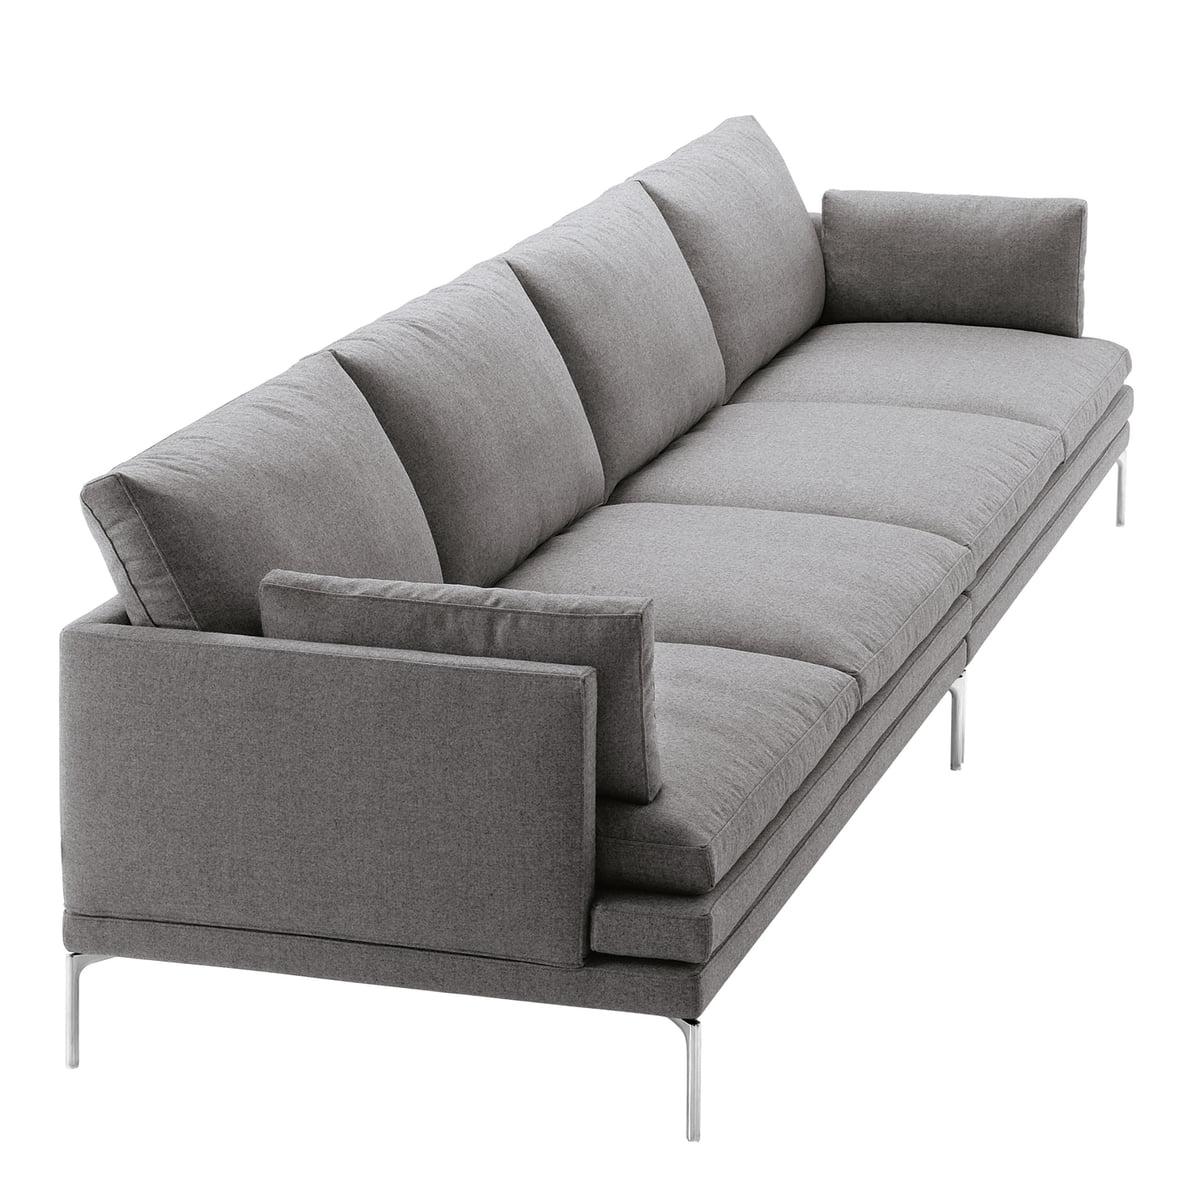 Zanotta Sofa William jetzt kaufen   Connox